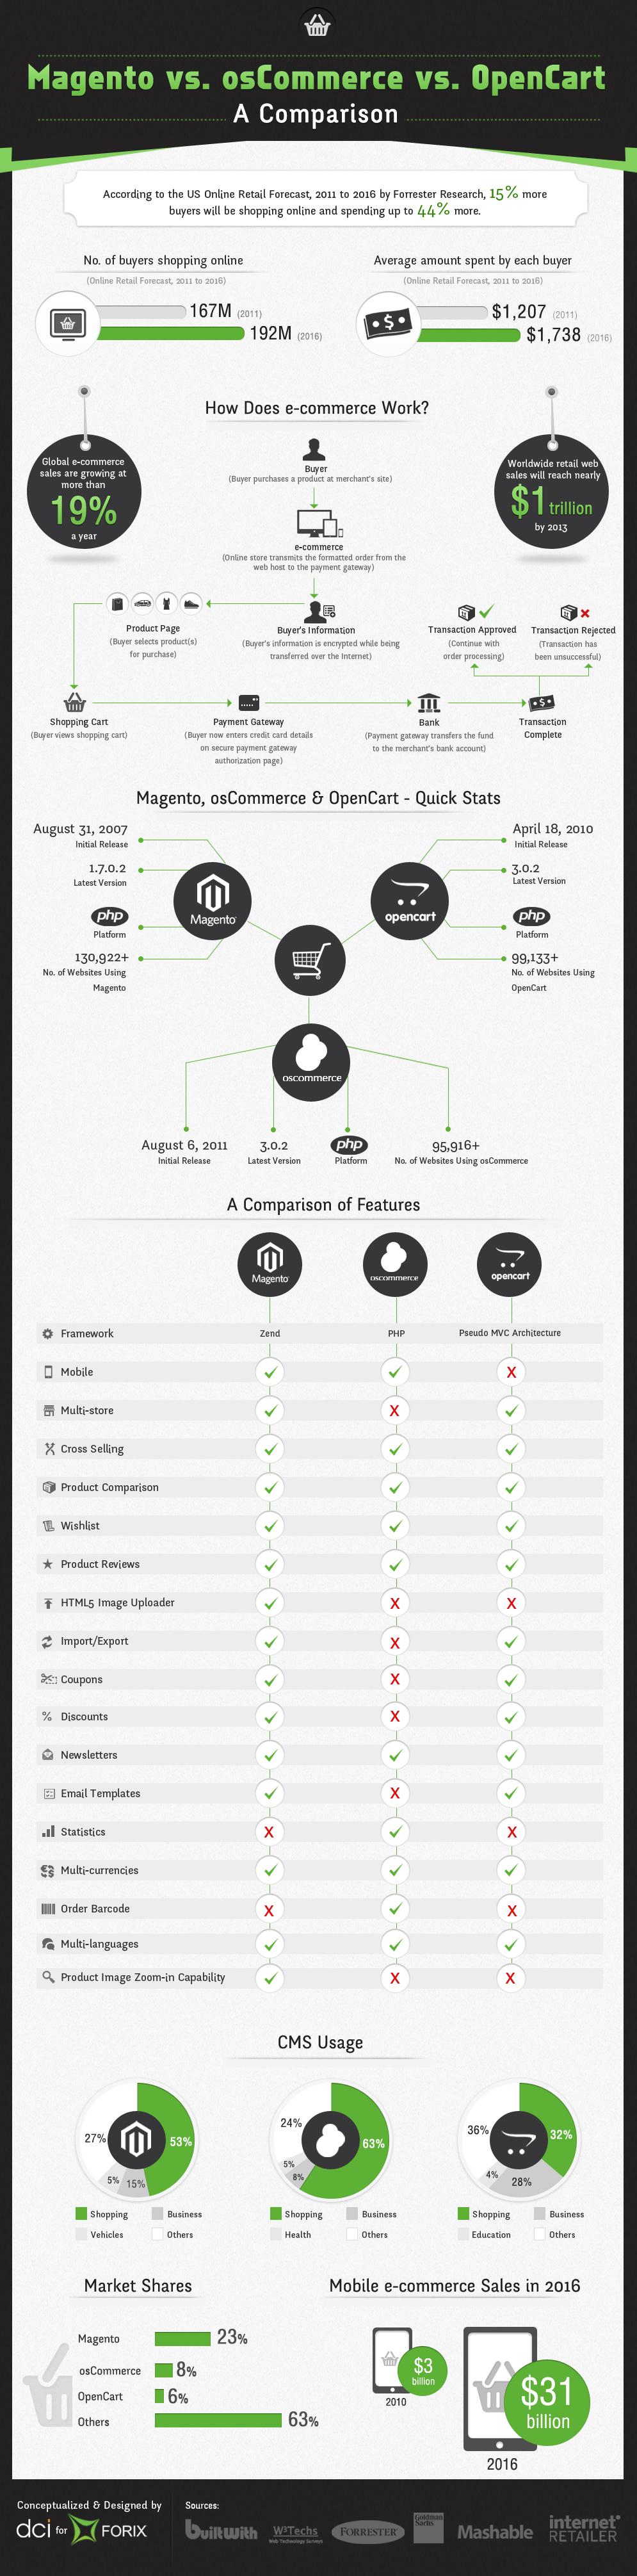 Magento vs osCommerce vs OpenCart - A CMS Comparison